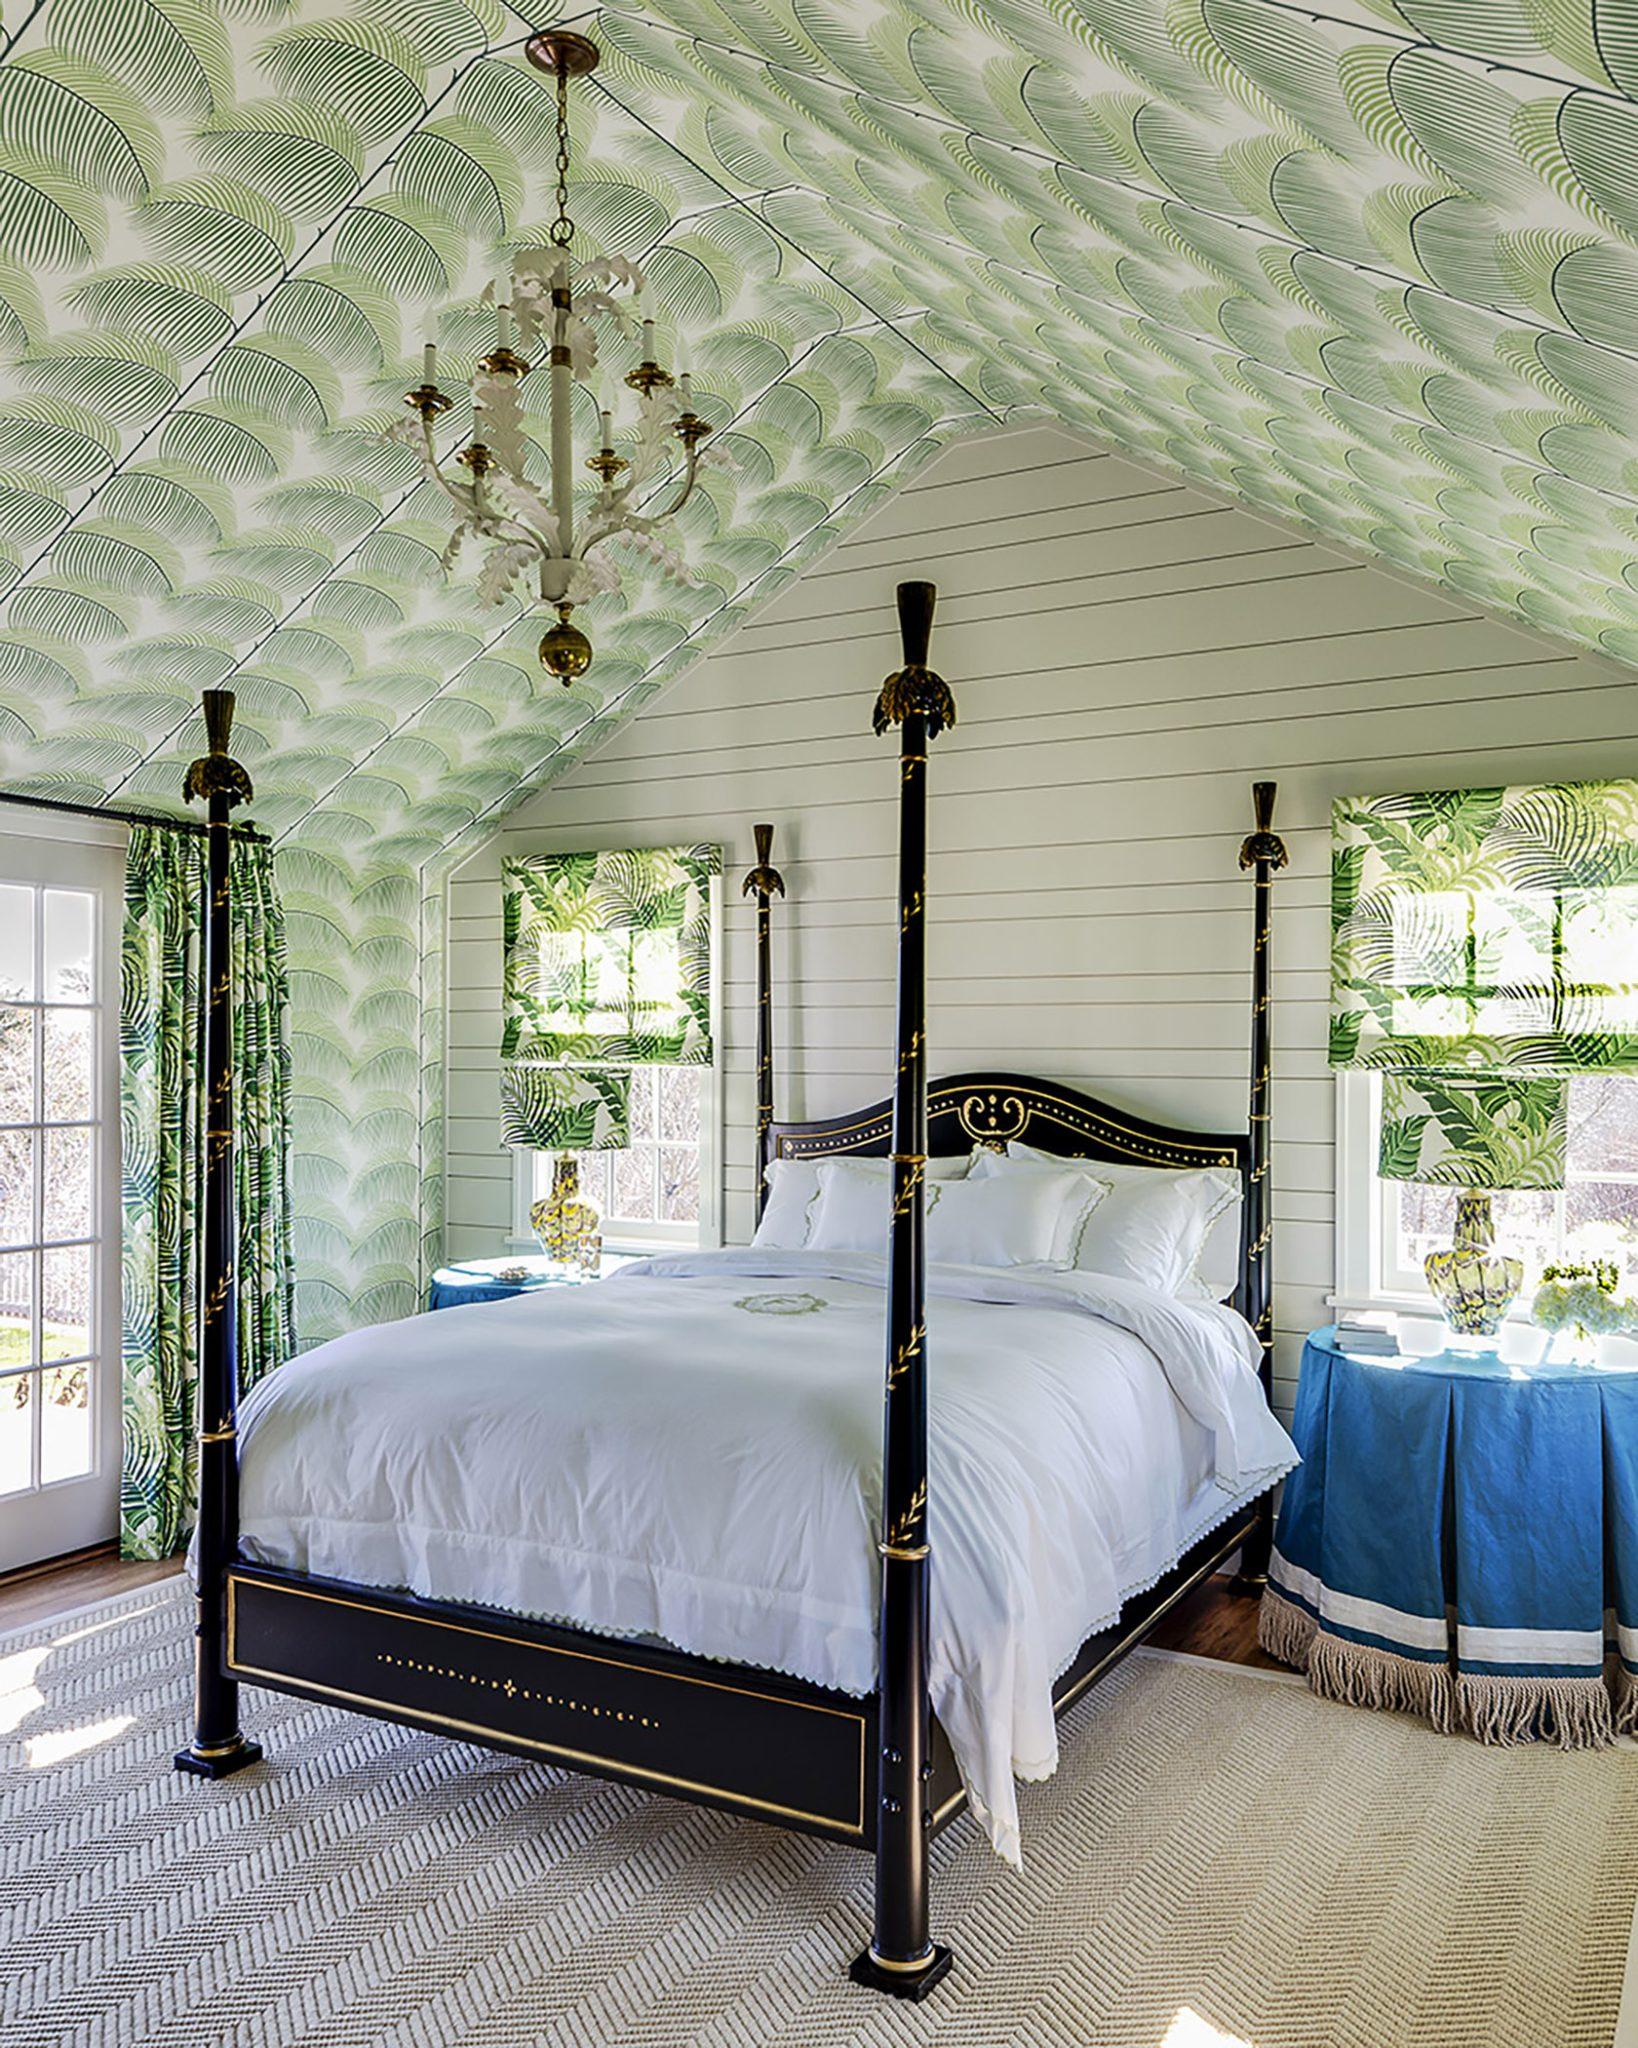 Interior design by Marks & Frantz